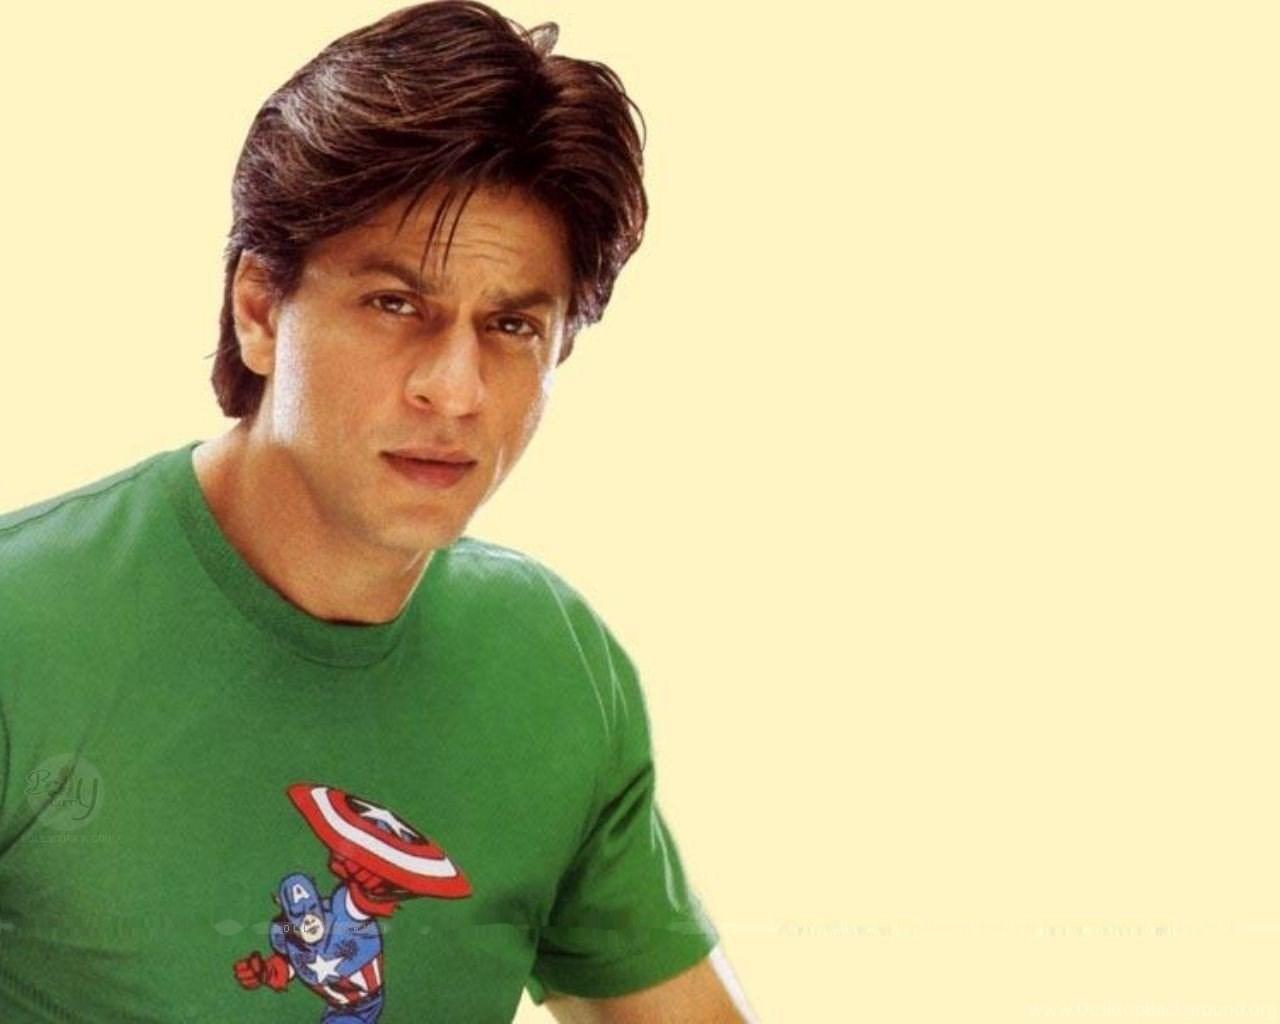 Shahrukh Khan Wallpapers: Shahrukh Khan HD Wallpapers EP Desktop Background